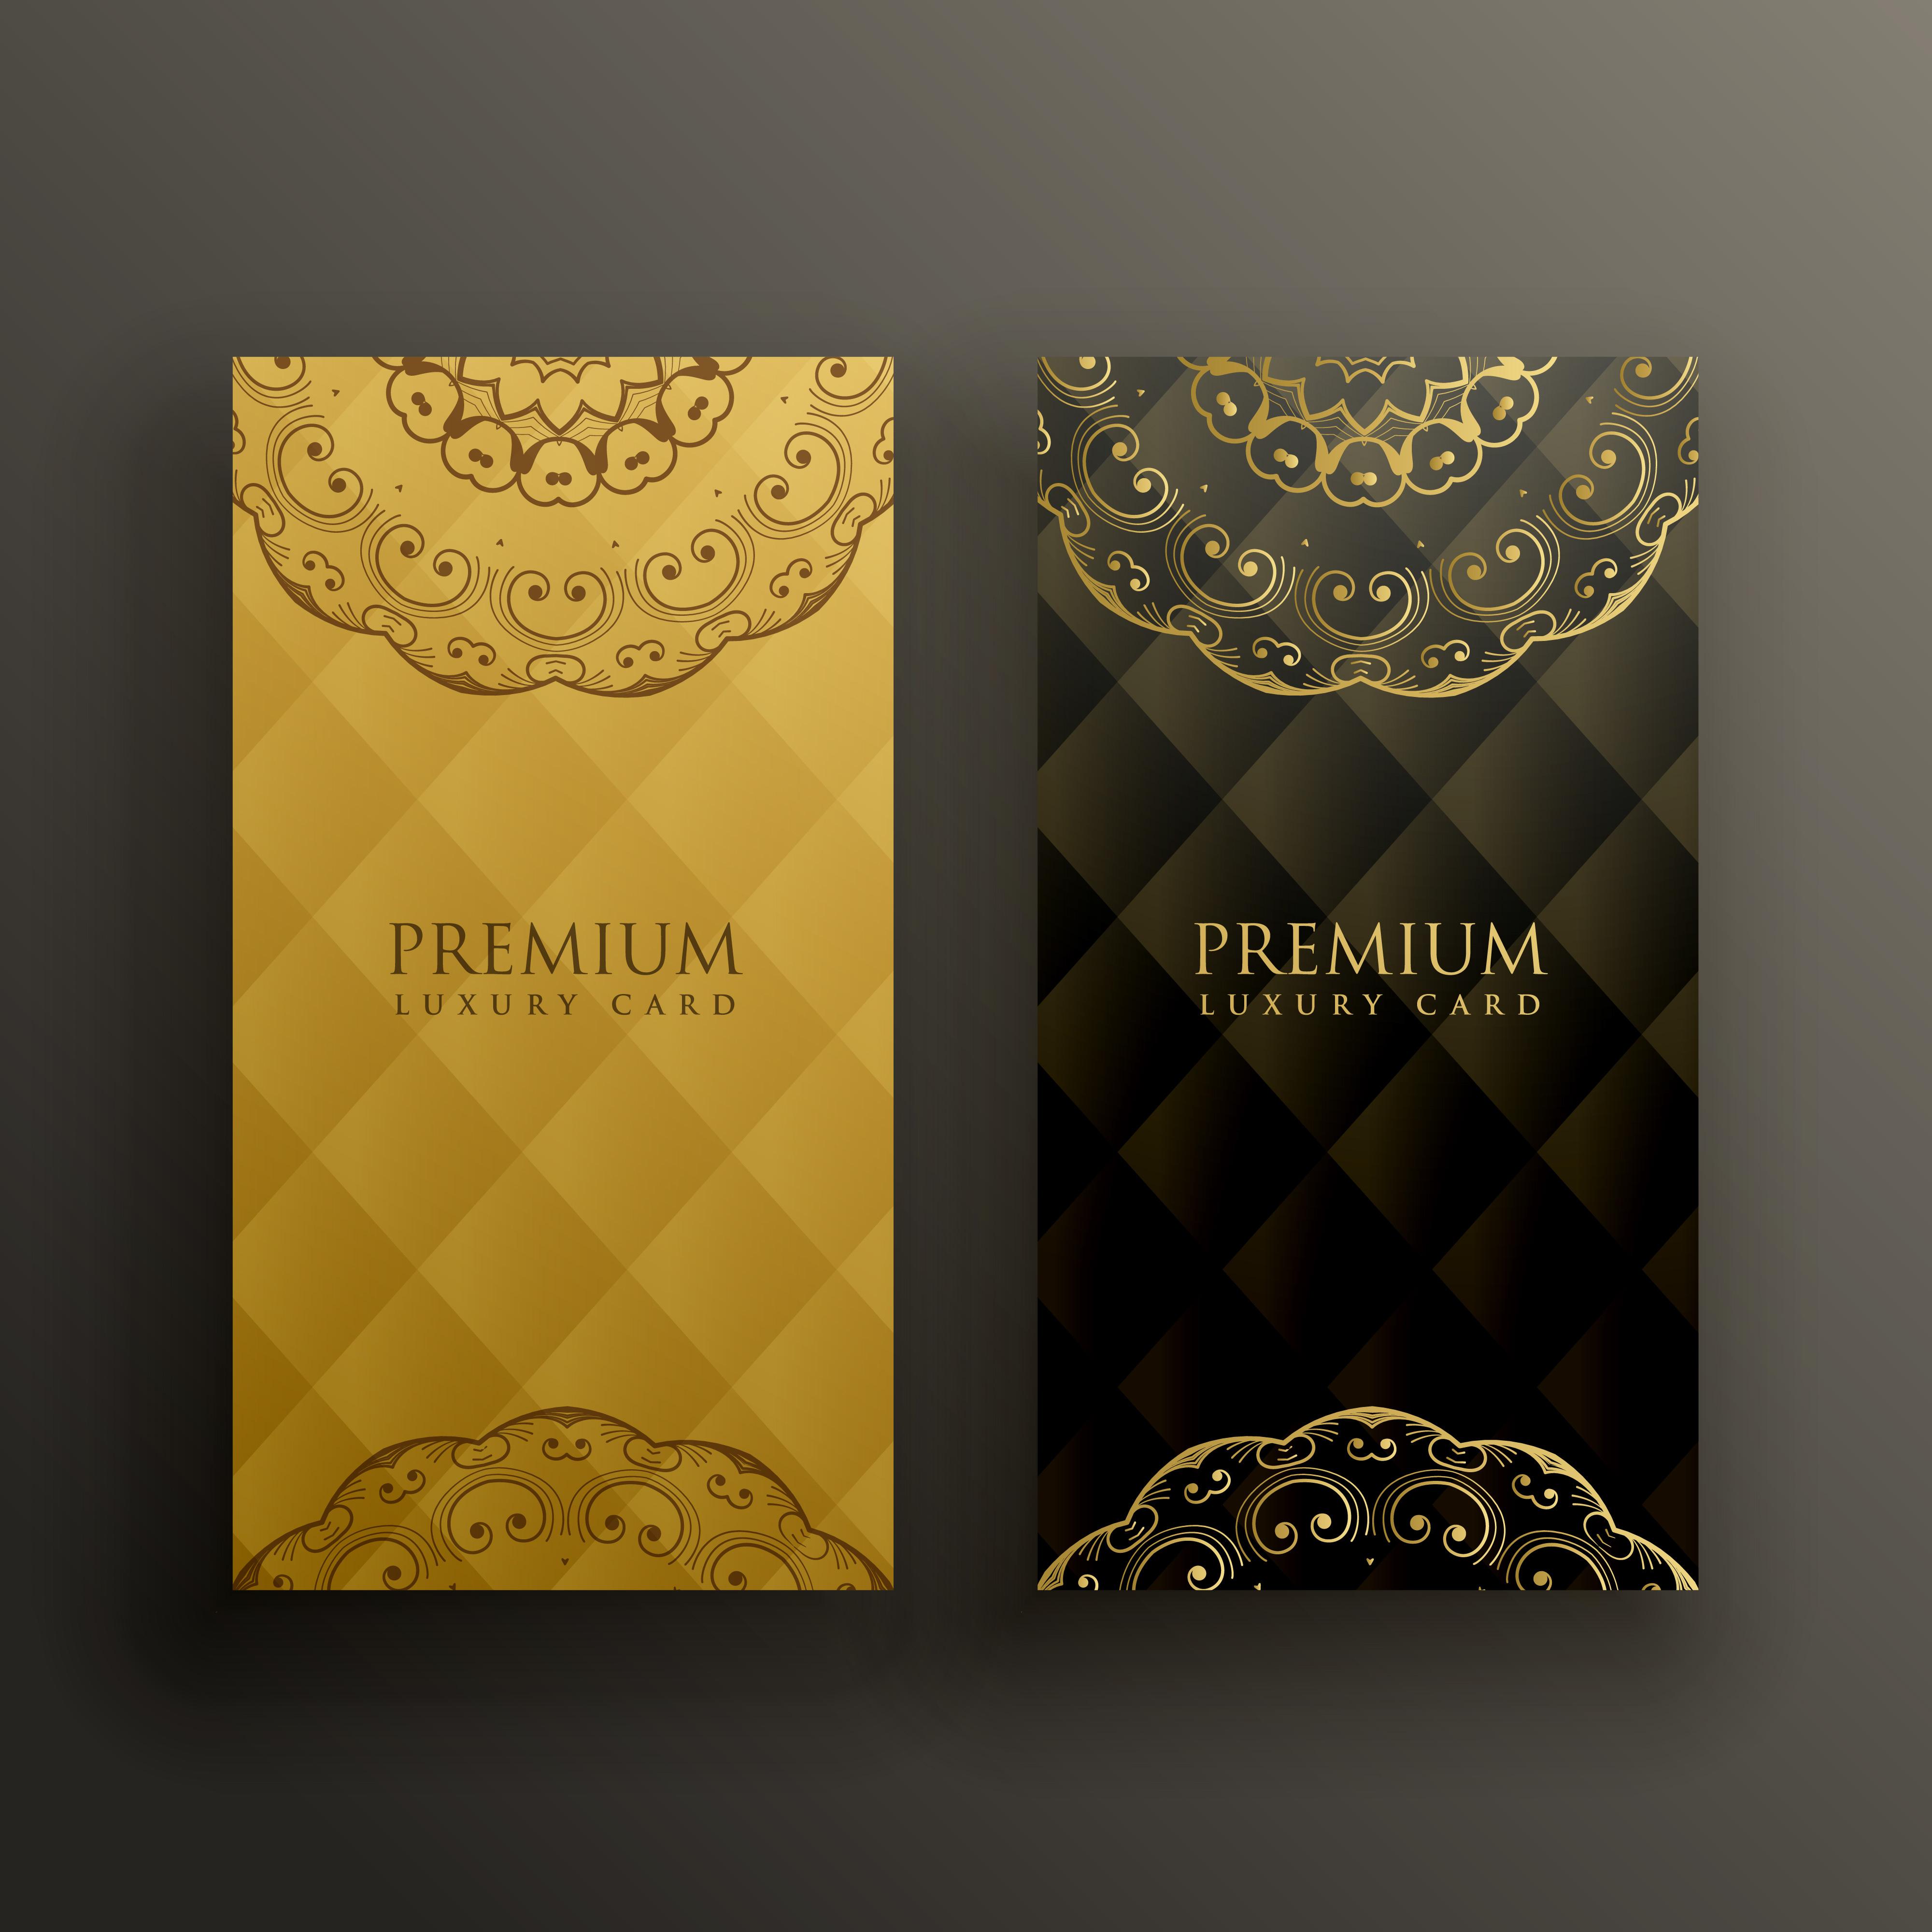 Stylish Mandala Premium Golden Card Design